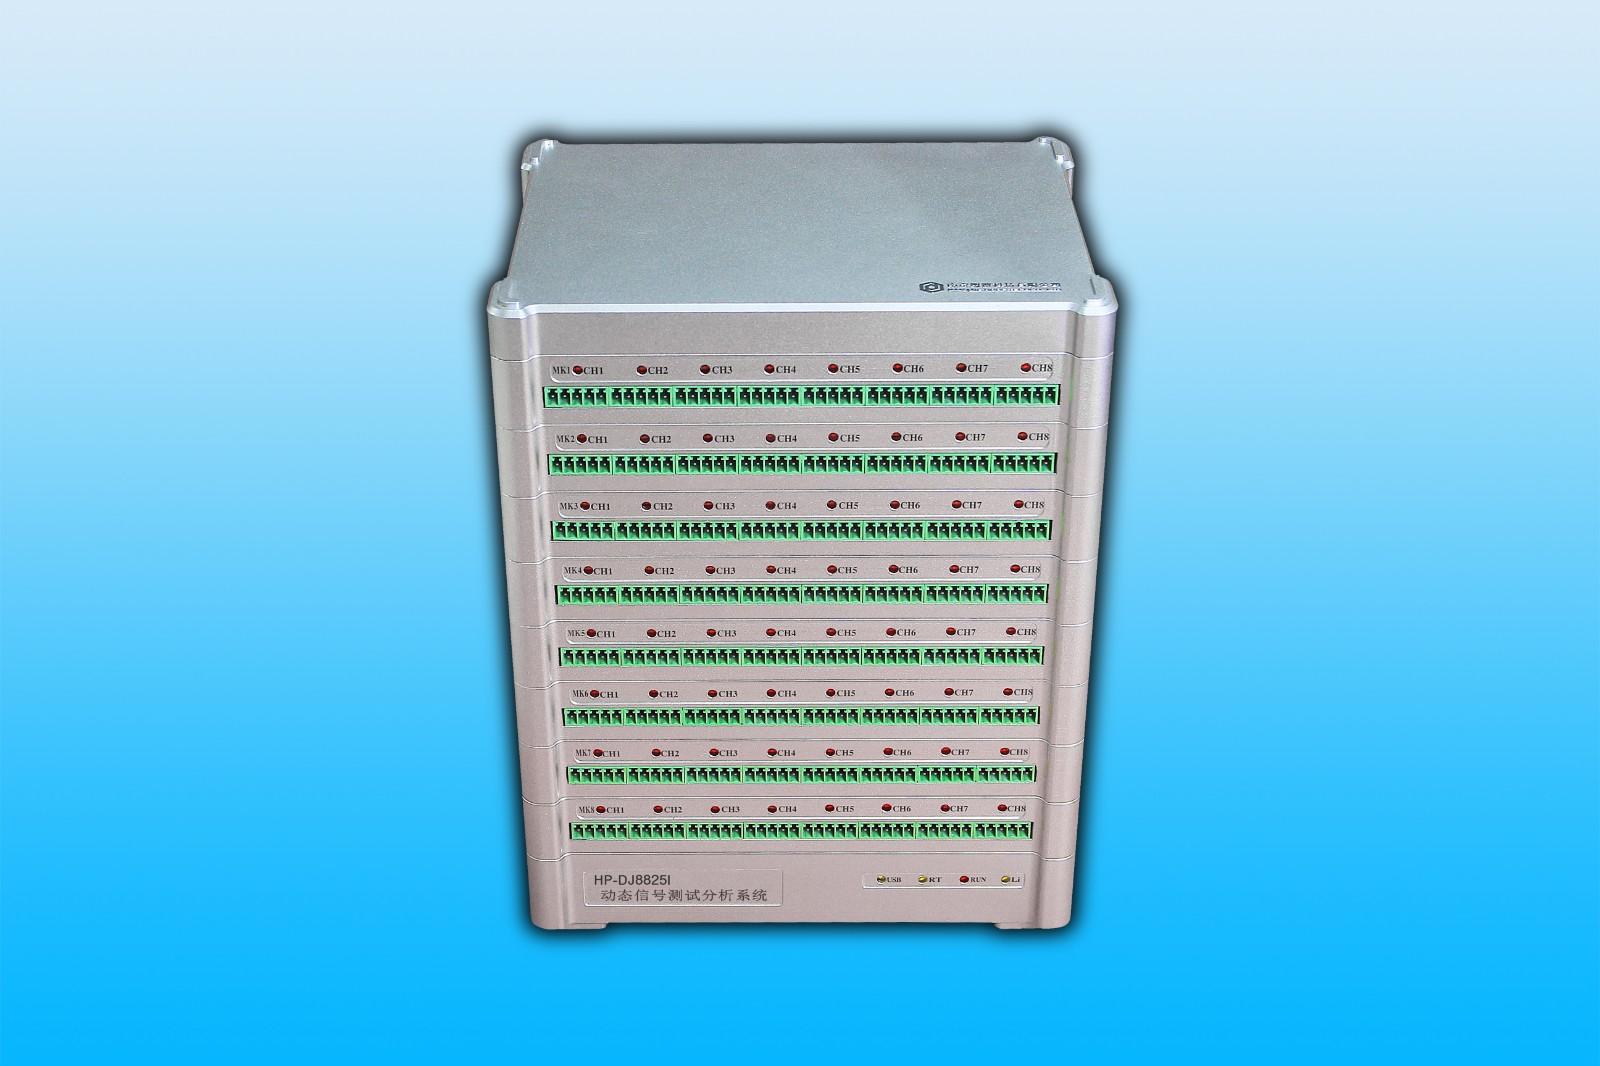 HP-DJ8825I 动态信号测试分析系统